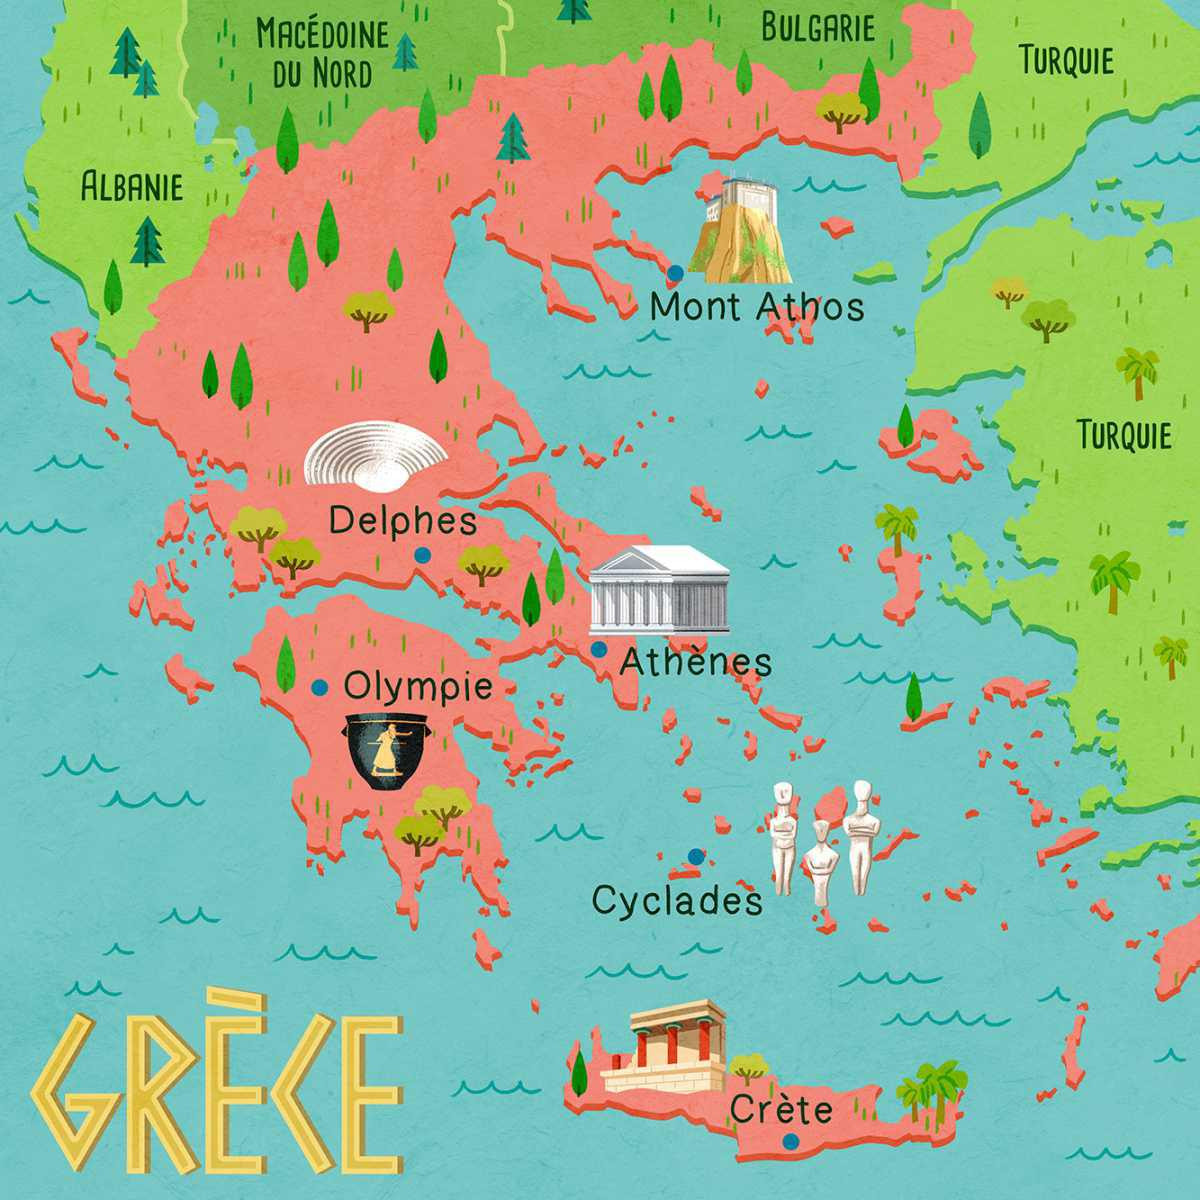 La carte de Grèce